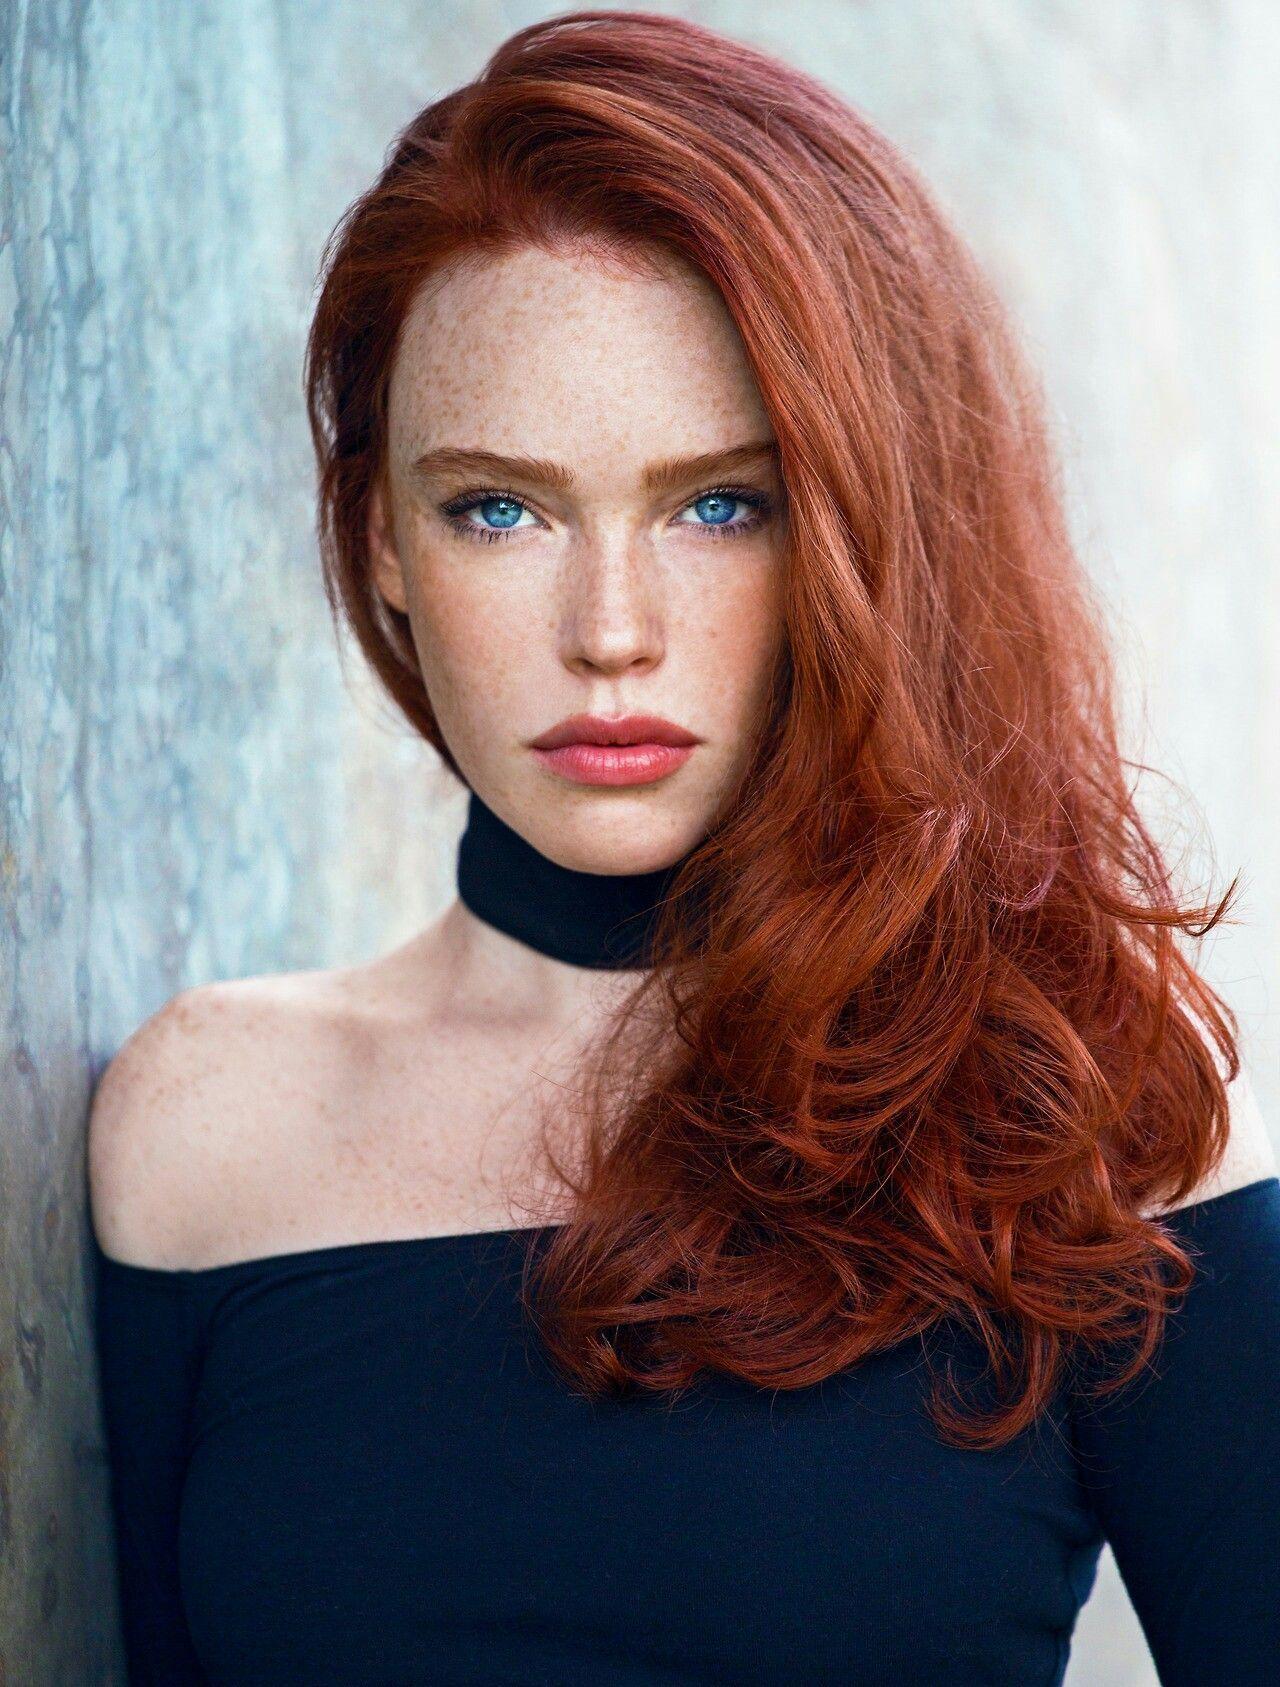 Snowdrop reccomend Ultimate vacuum paul redhead